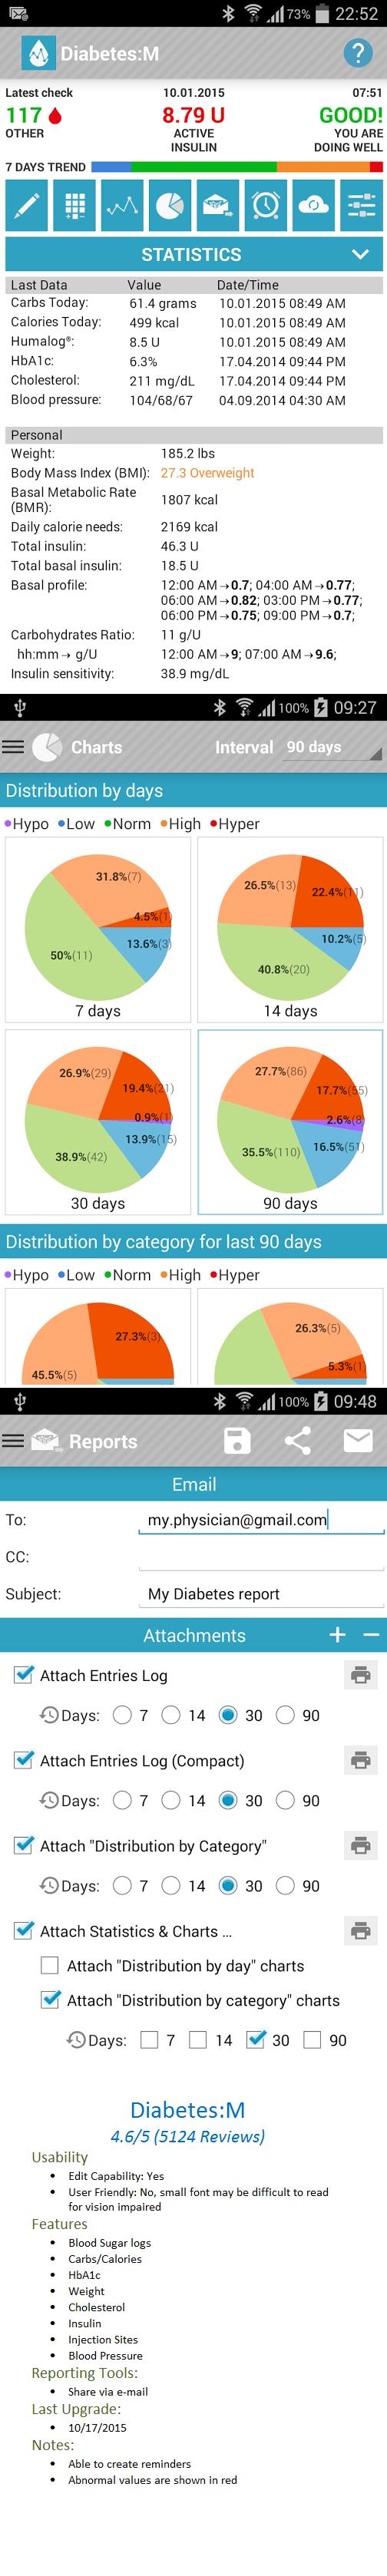 Manage Diabetes Type 1, Type 2, Gesatational with this Mobile Health App called Diabetes:M  Great app for Nursing, Medicine, Diabetes Management